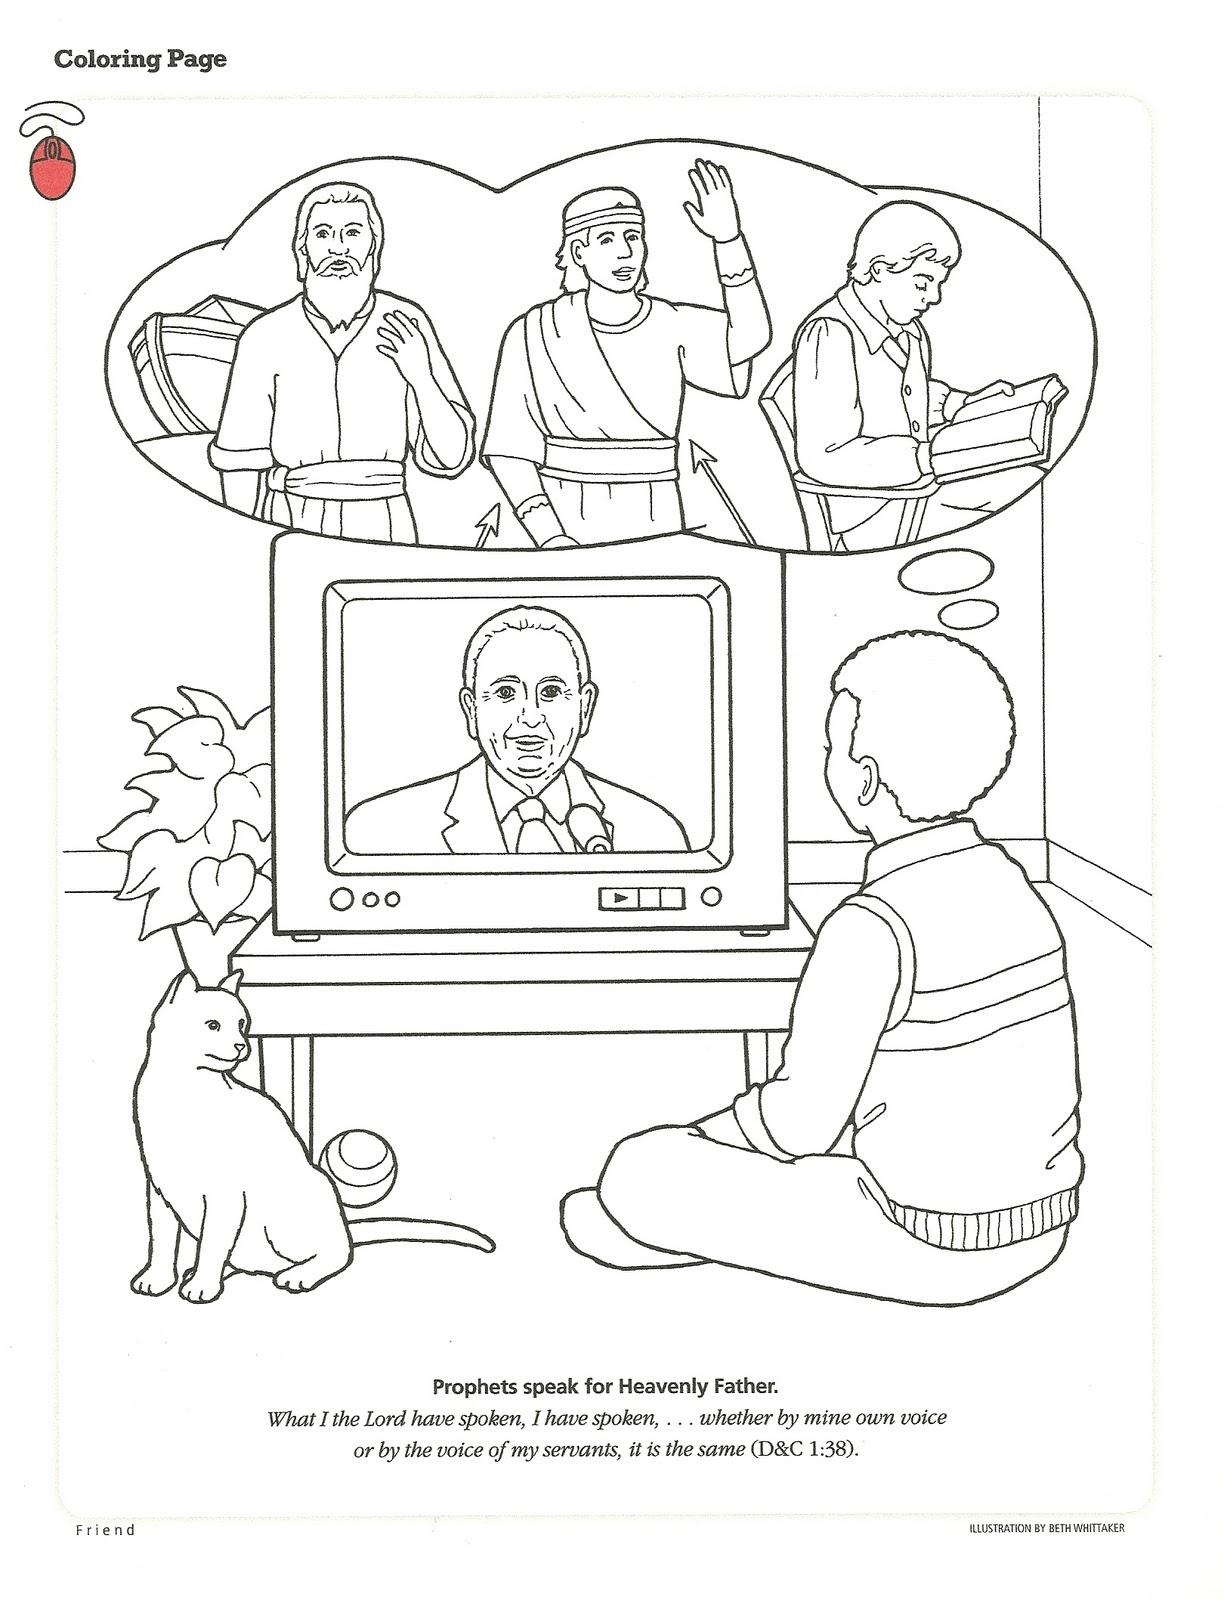 Thomas s monson coloring page free coloring pages for Thomas s monson coloring page